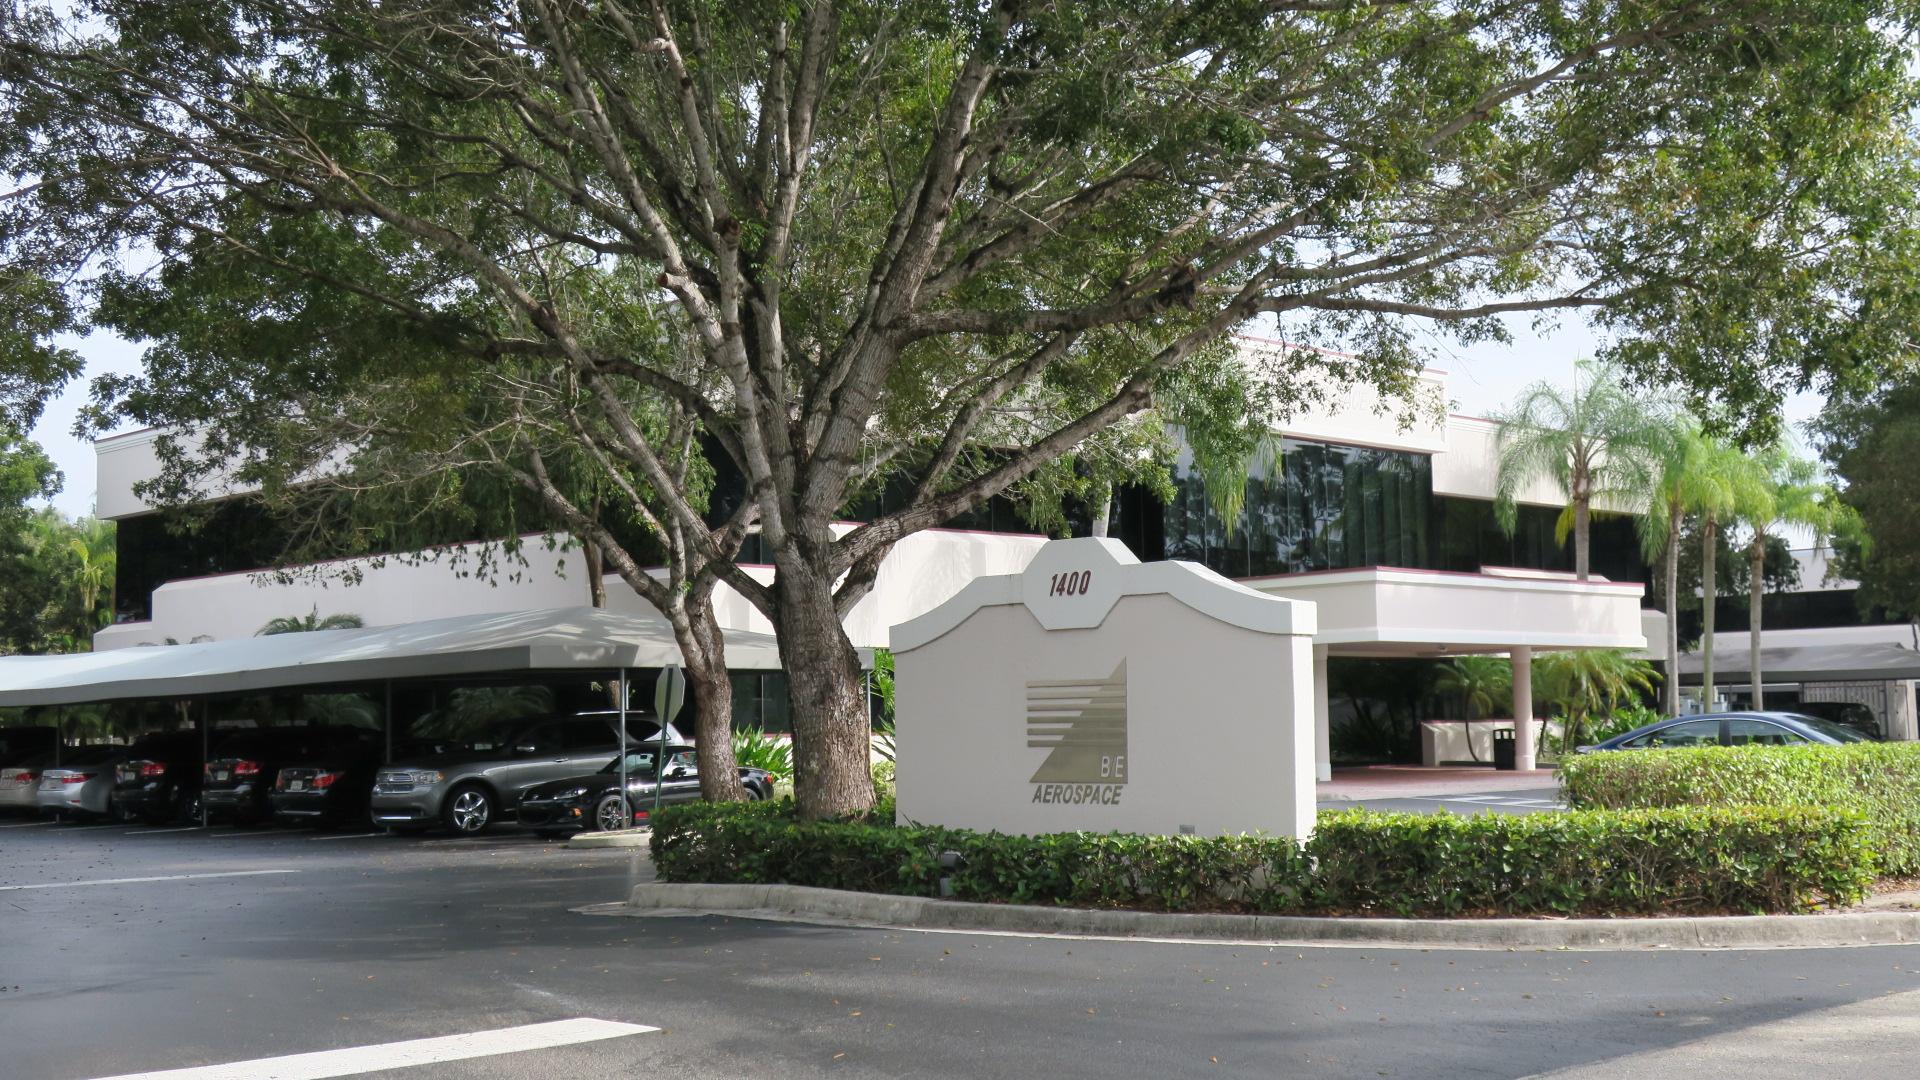 Entrance to B/E Aerospace's corporate headquarters in Wellington, Florida.